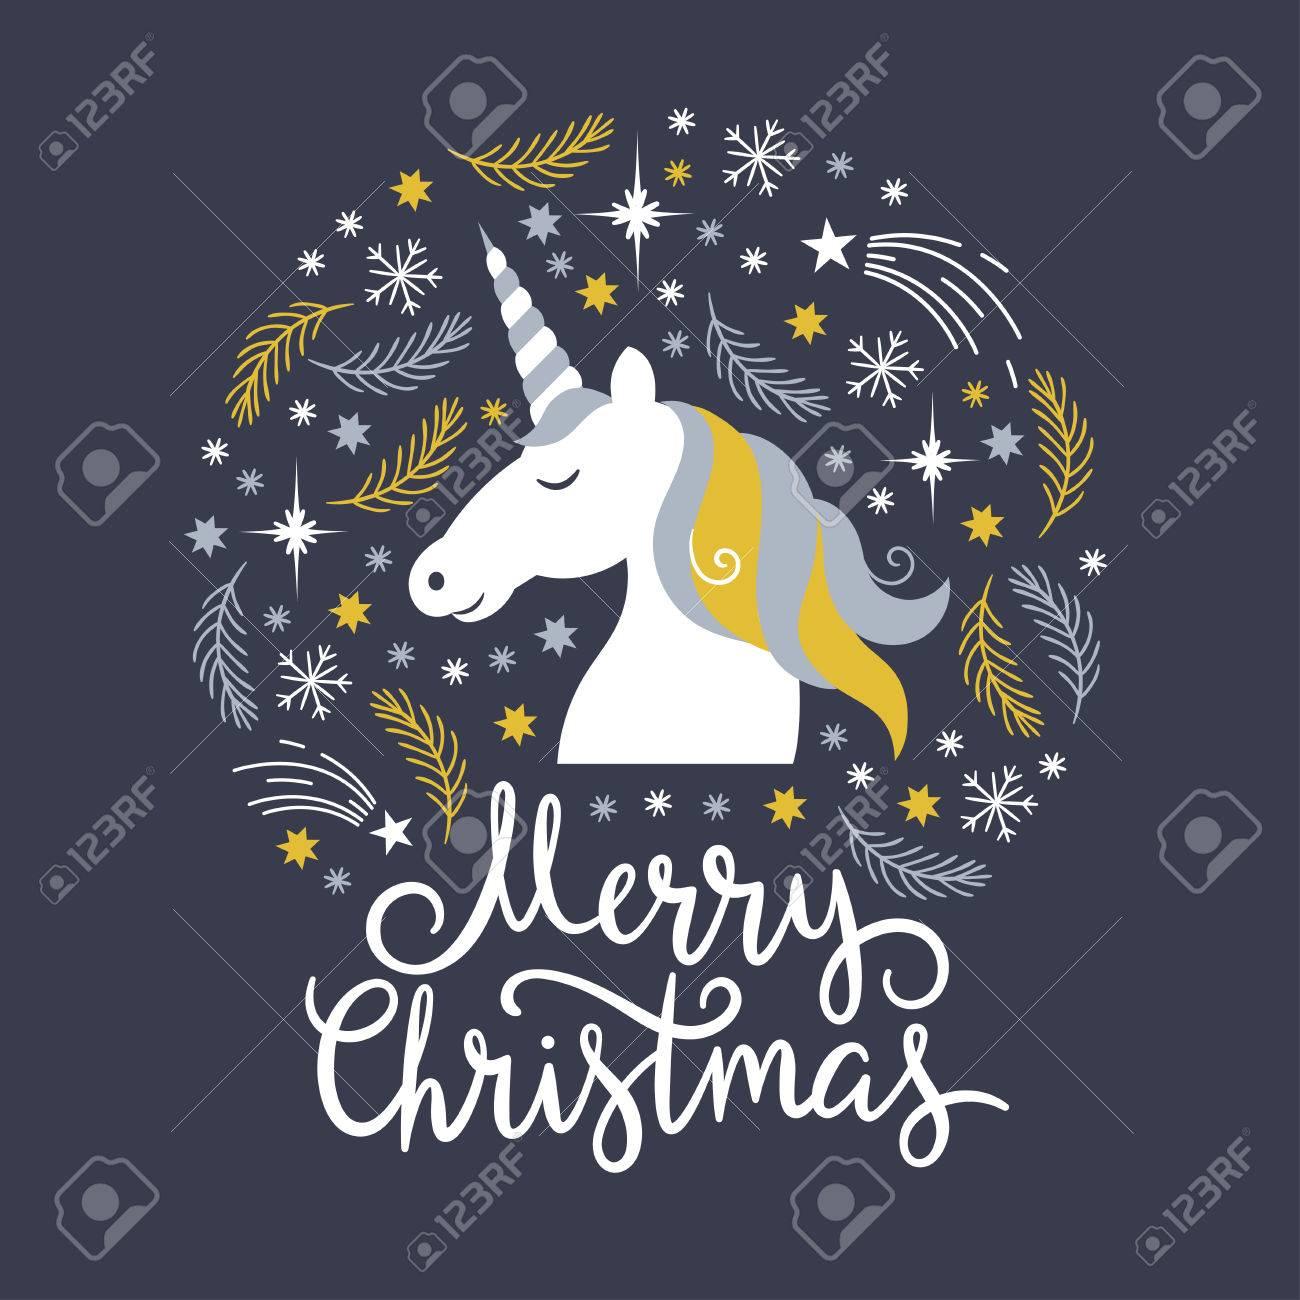 Christmas Unicorn.Christmas Illustration Merry Christmas Unicorn